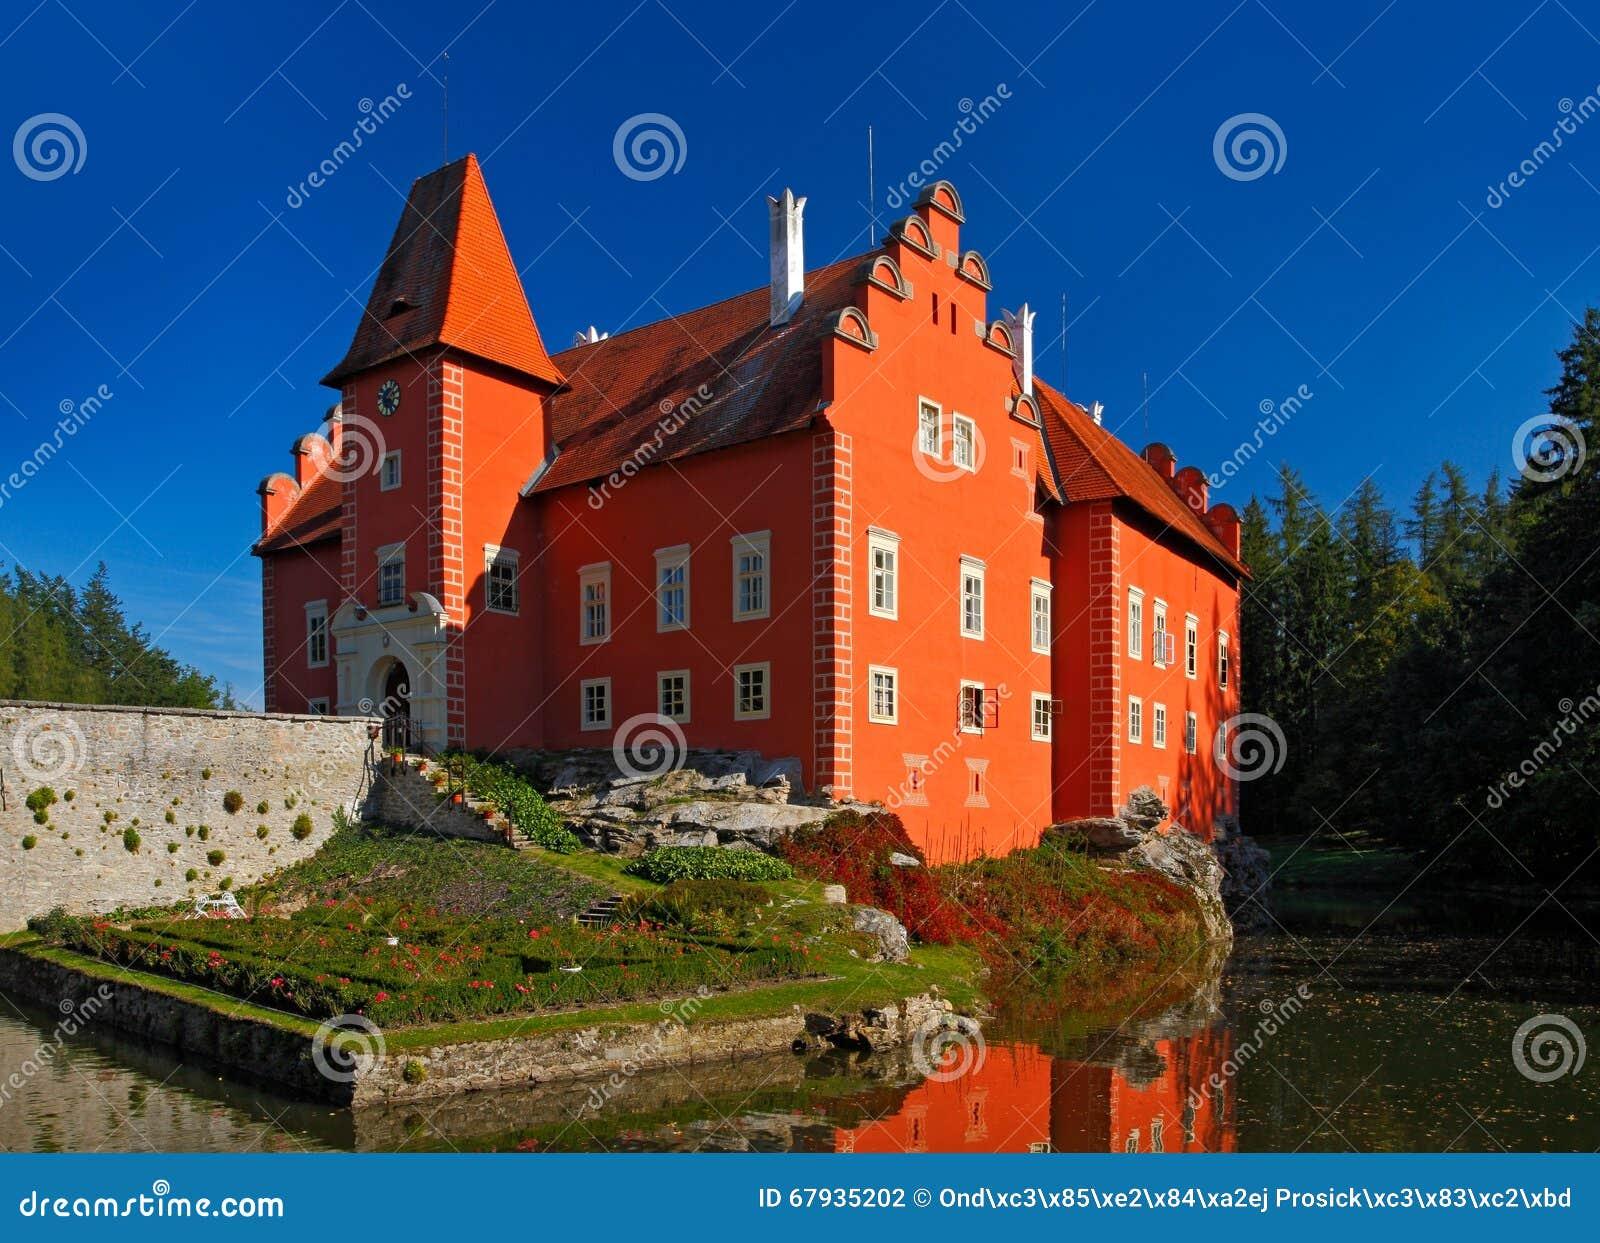 Fairy tale red castle on the lake, with dark blue sky, state castle Cervena Lhota, Czech republic